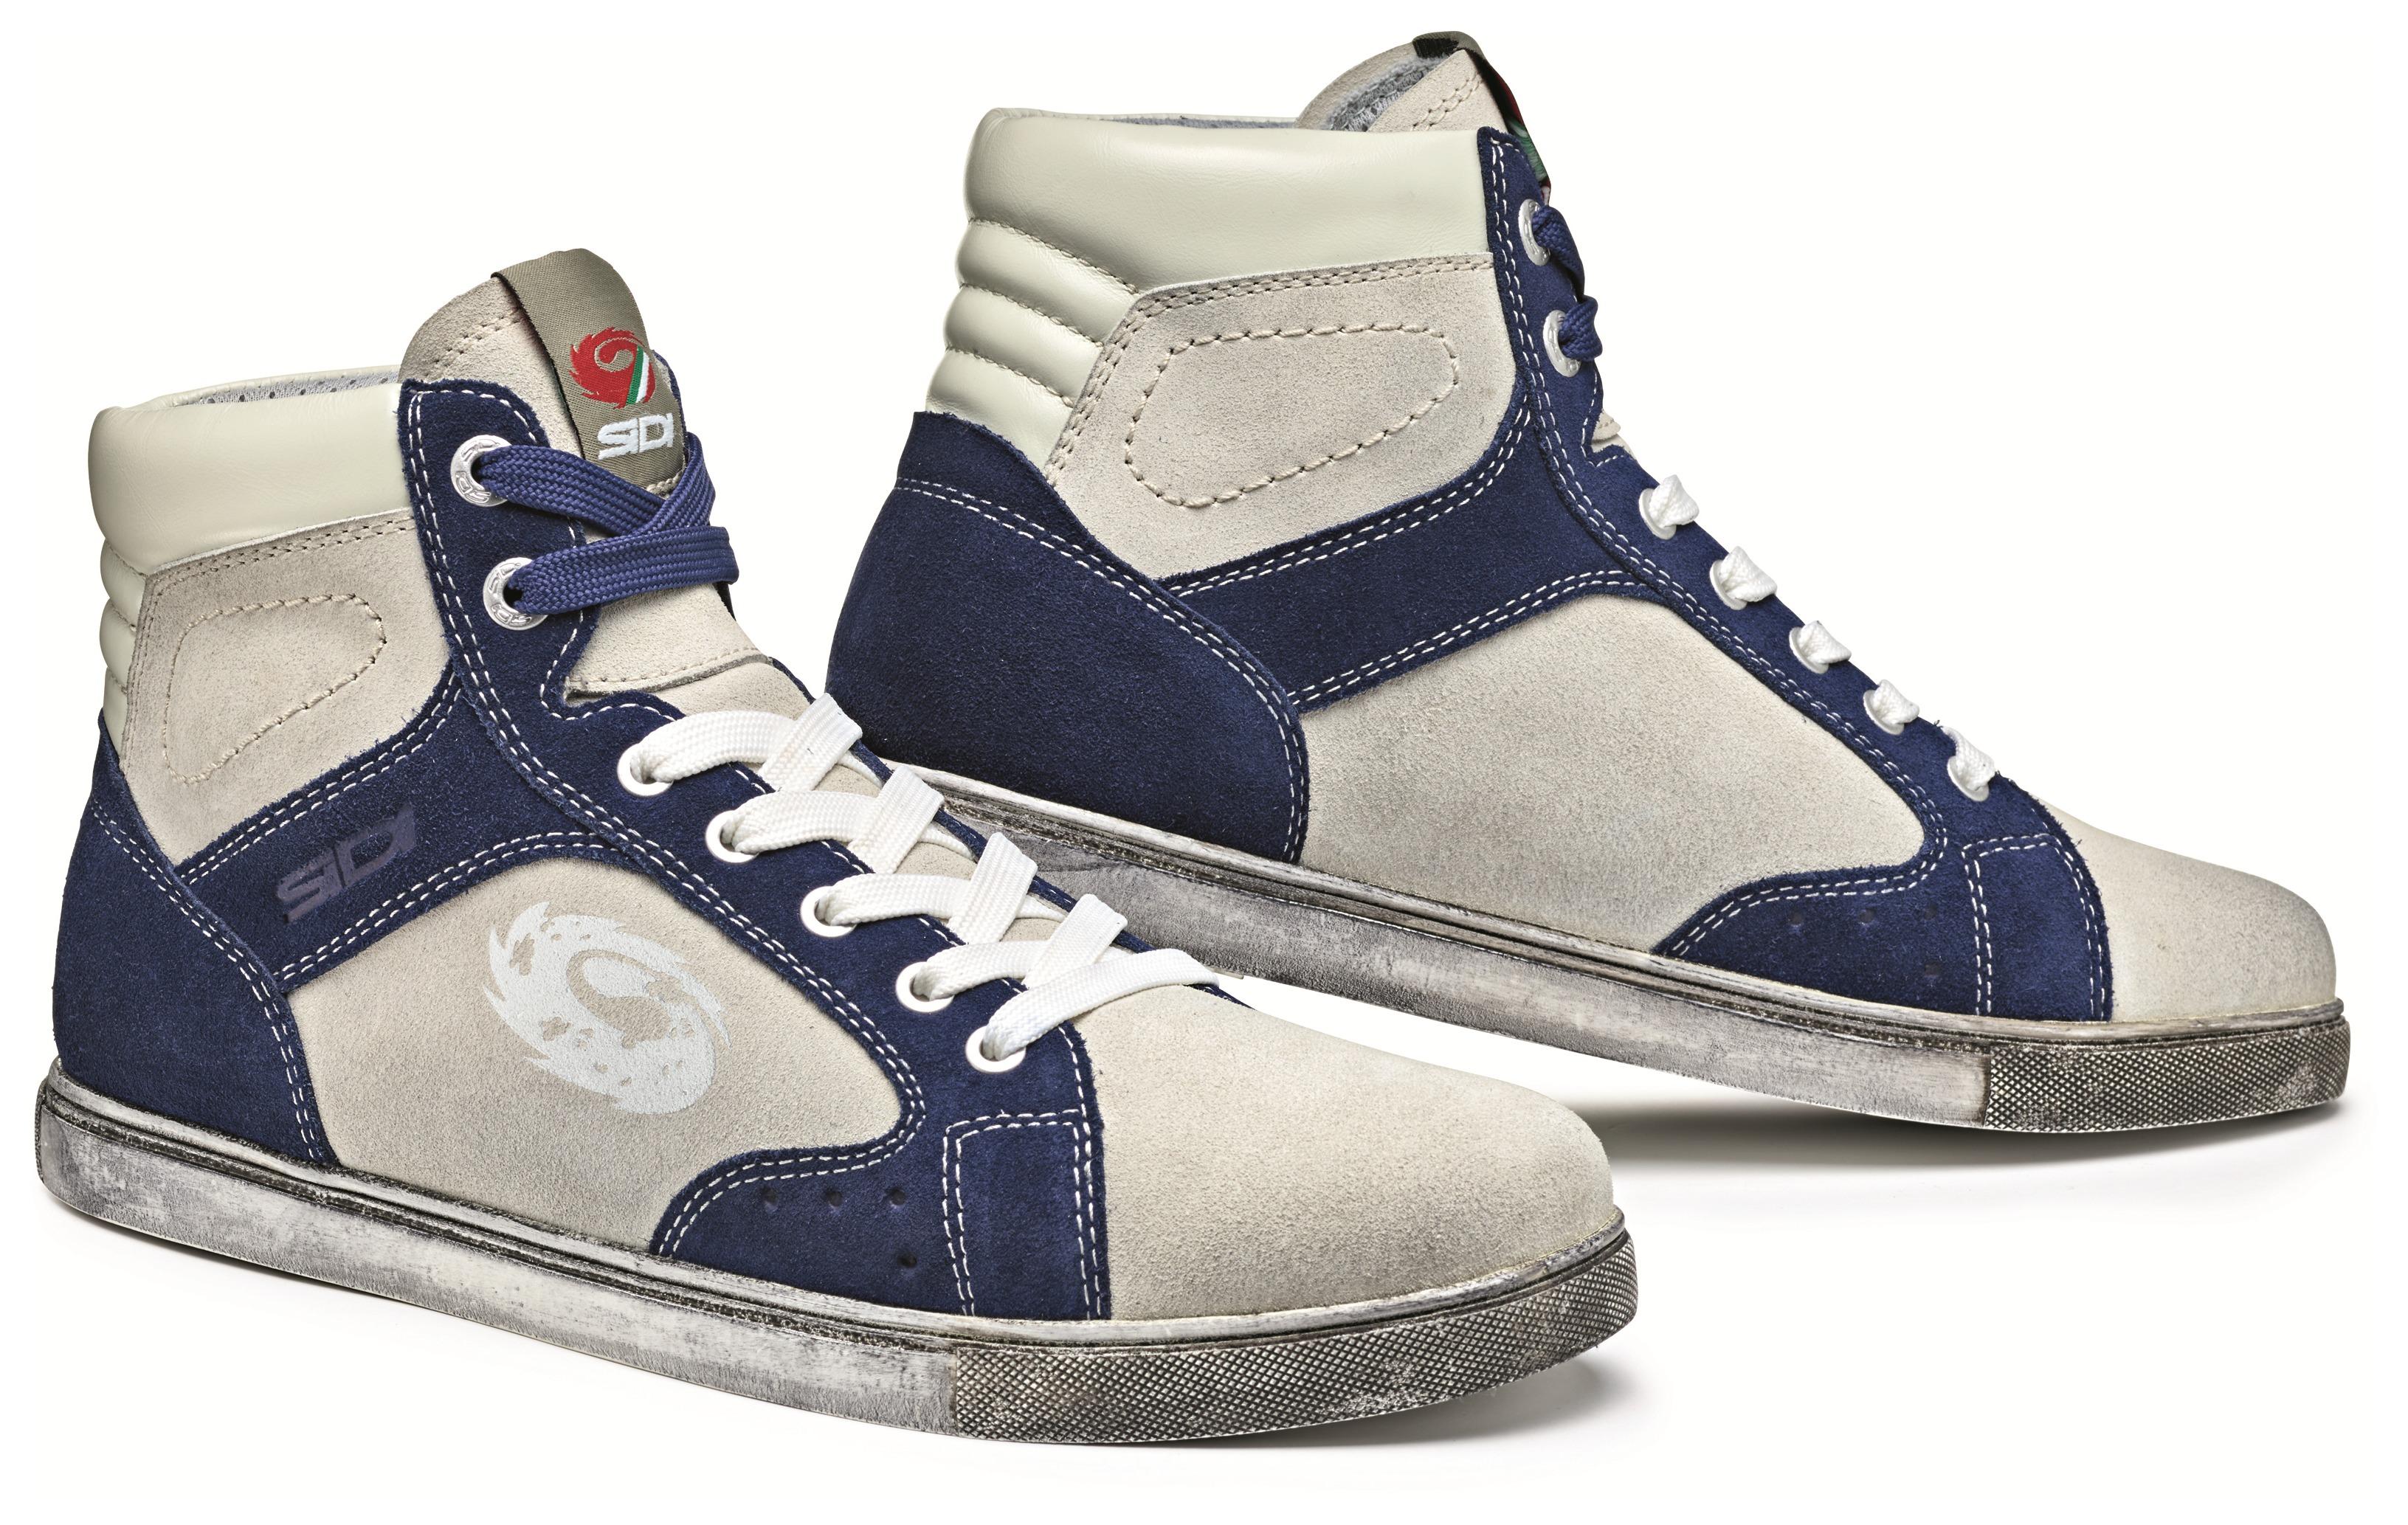 finest selection 04cb2 27e30 SIDI SDS Frontera Riding Shoes - RevZilla